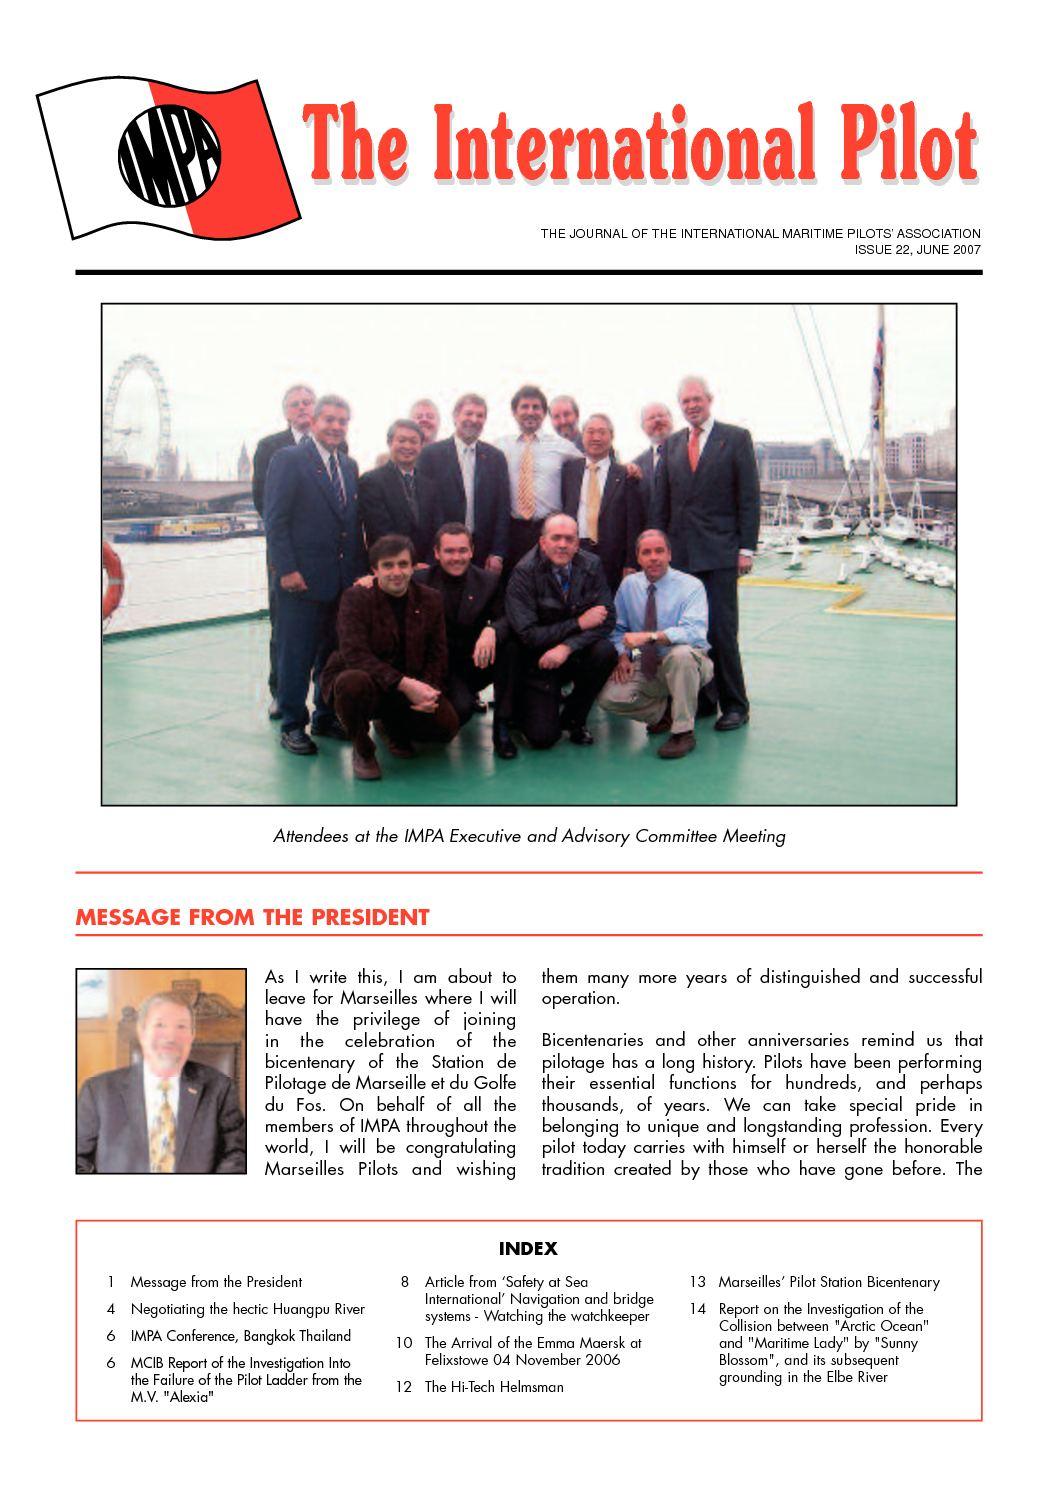 Calaméo - International Pilot - Issue 22